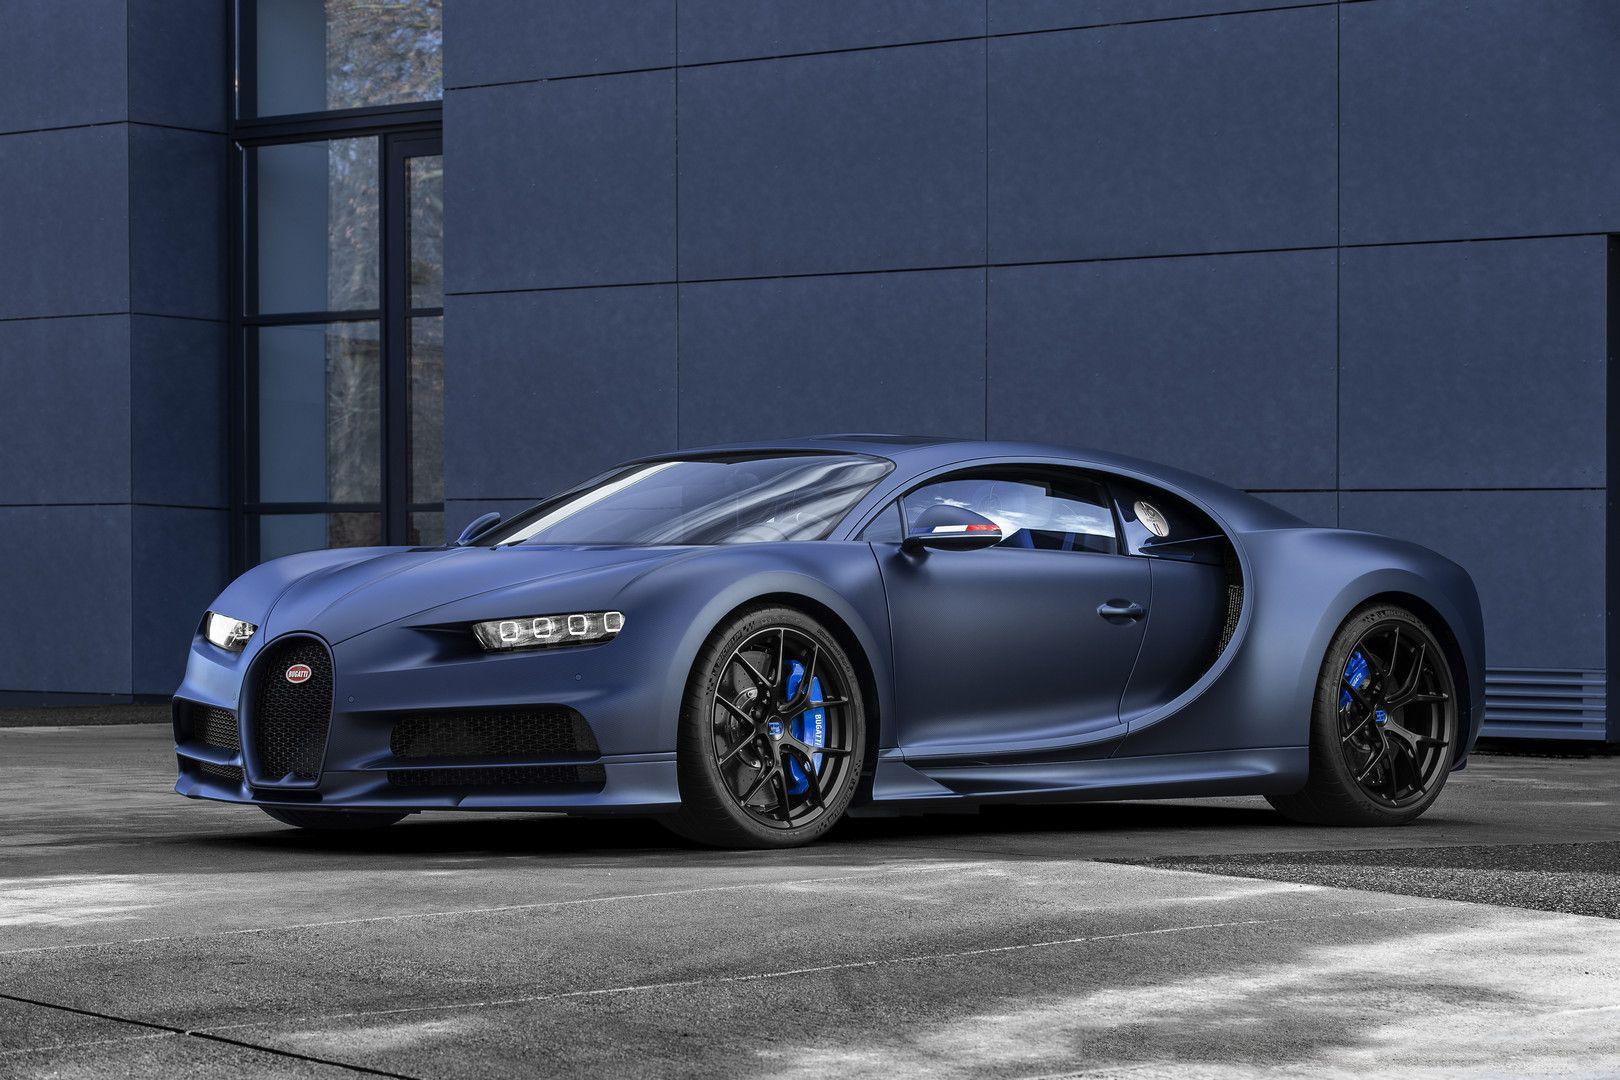 Bugatti Chiron Sport 110 Ans For Sale 1 Of 20 Worldwide Supercars For Sale In 2020 Bugatti Cars Bugatti Chiron Bugatti